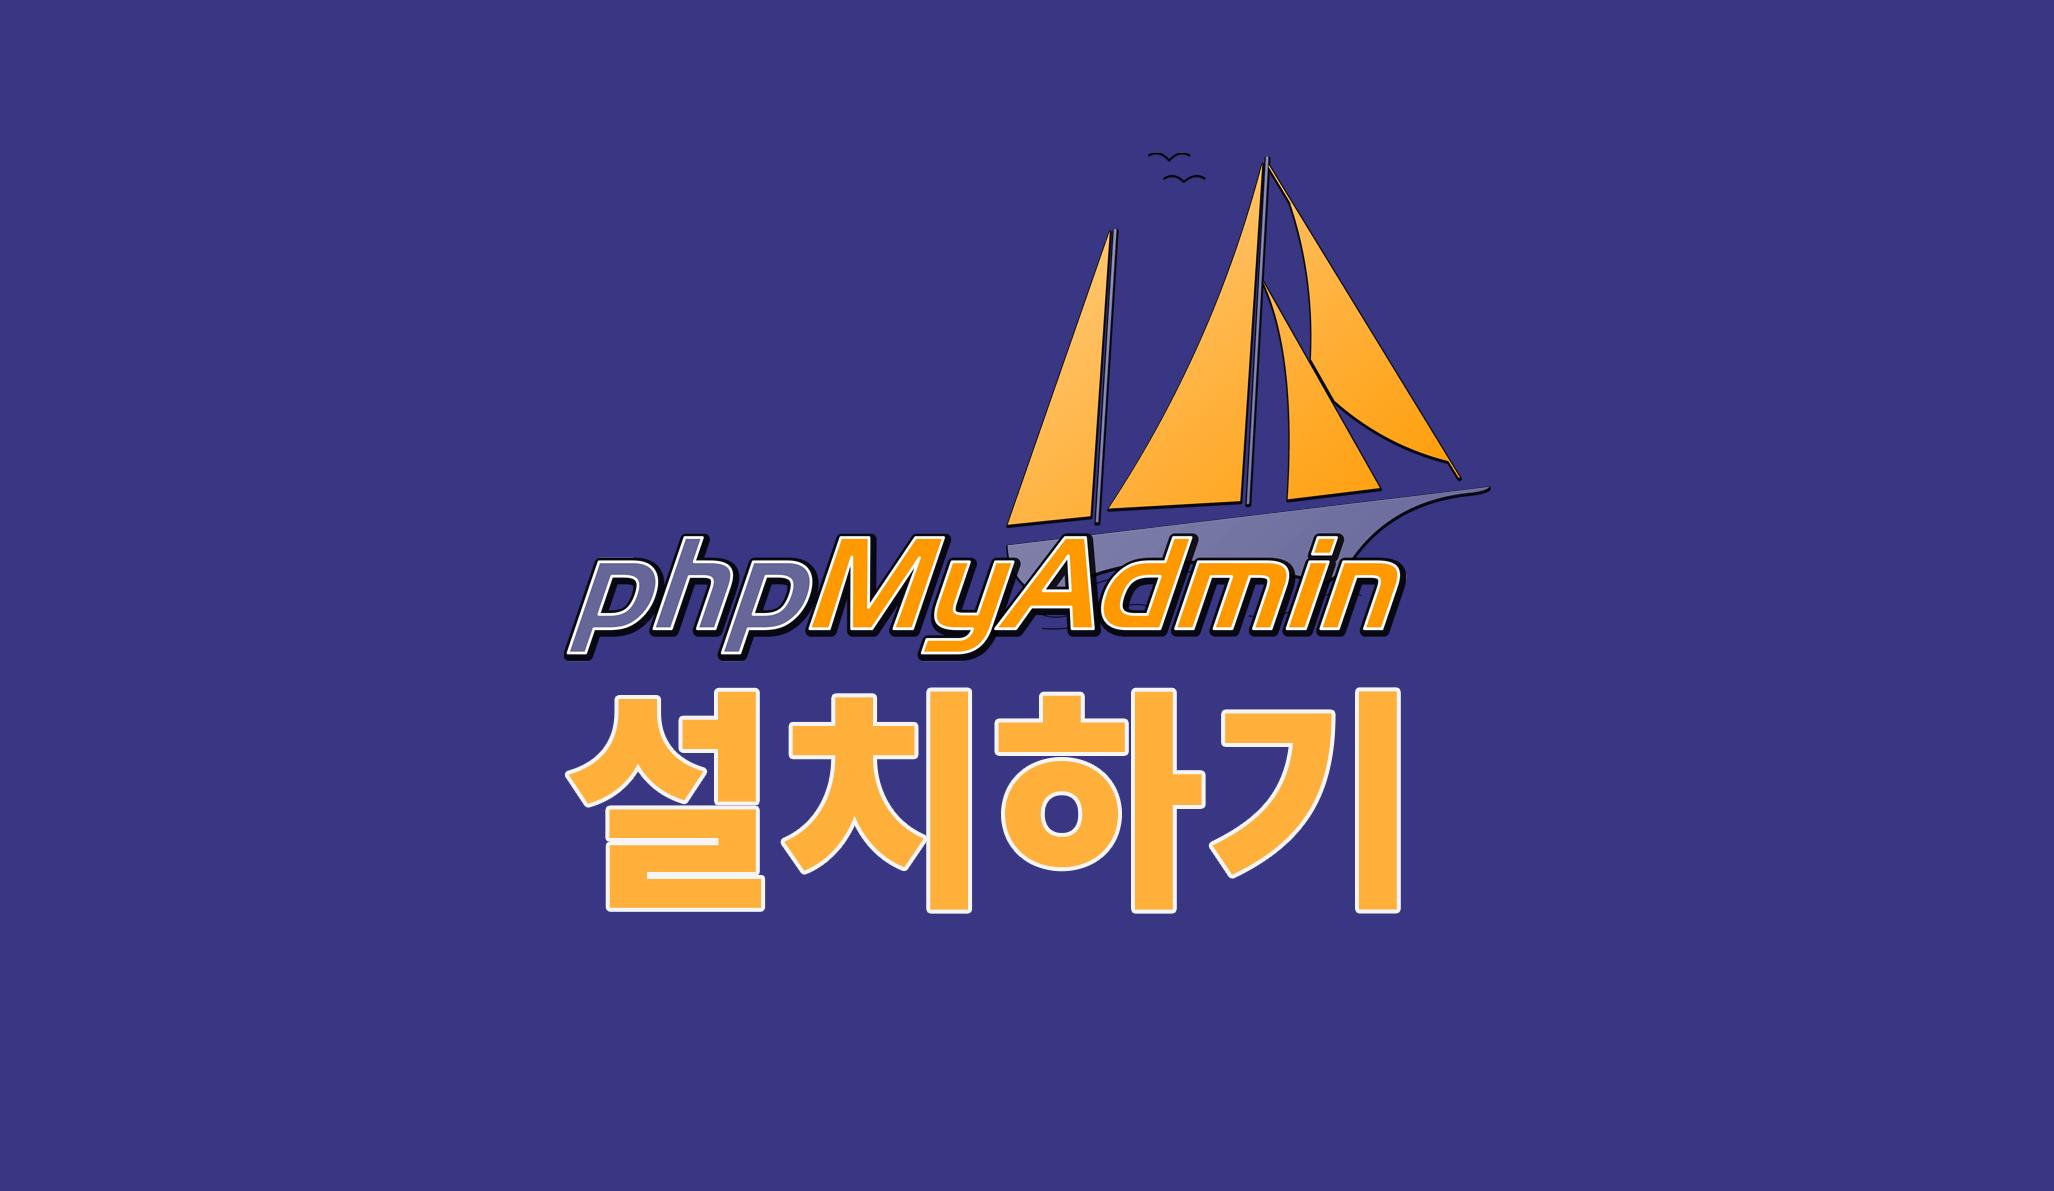 phpMyAdmin 로고가 그려진 설치방법에관한 글 대표이미지.